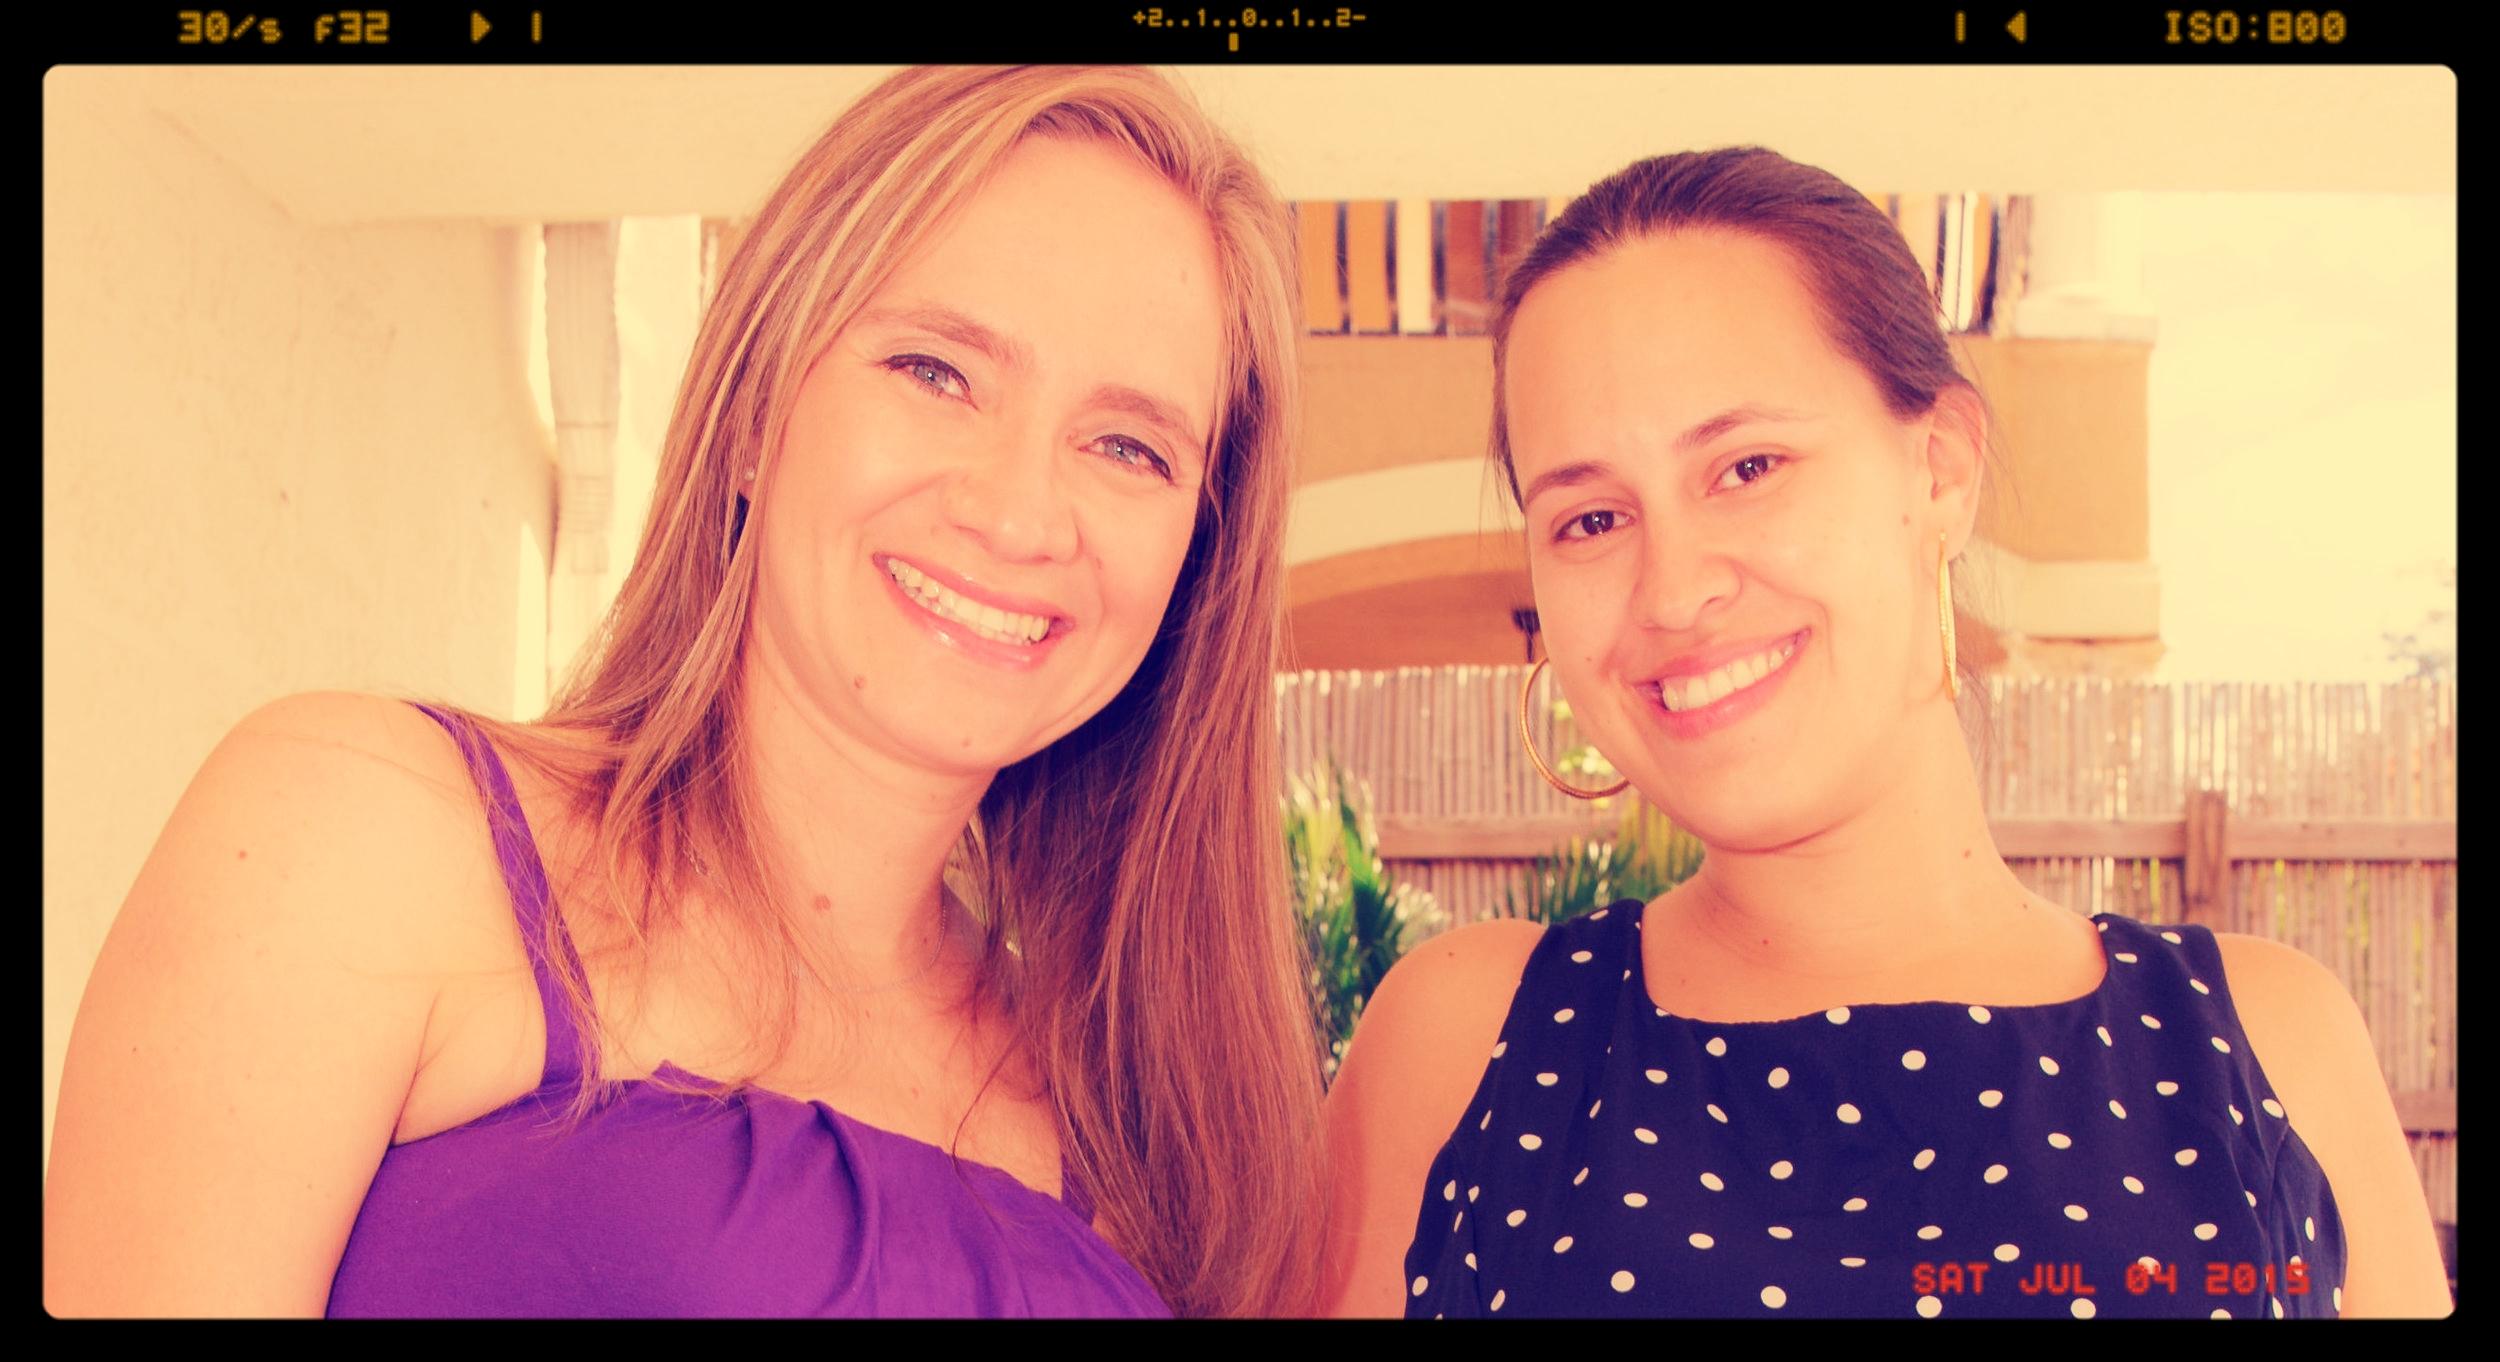 Sisters Carolina and Julie